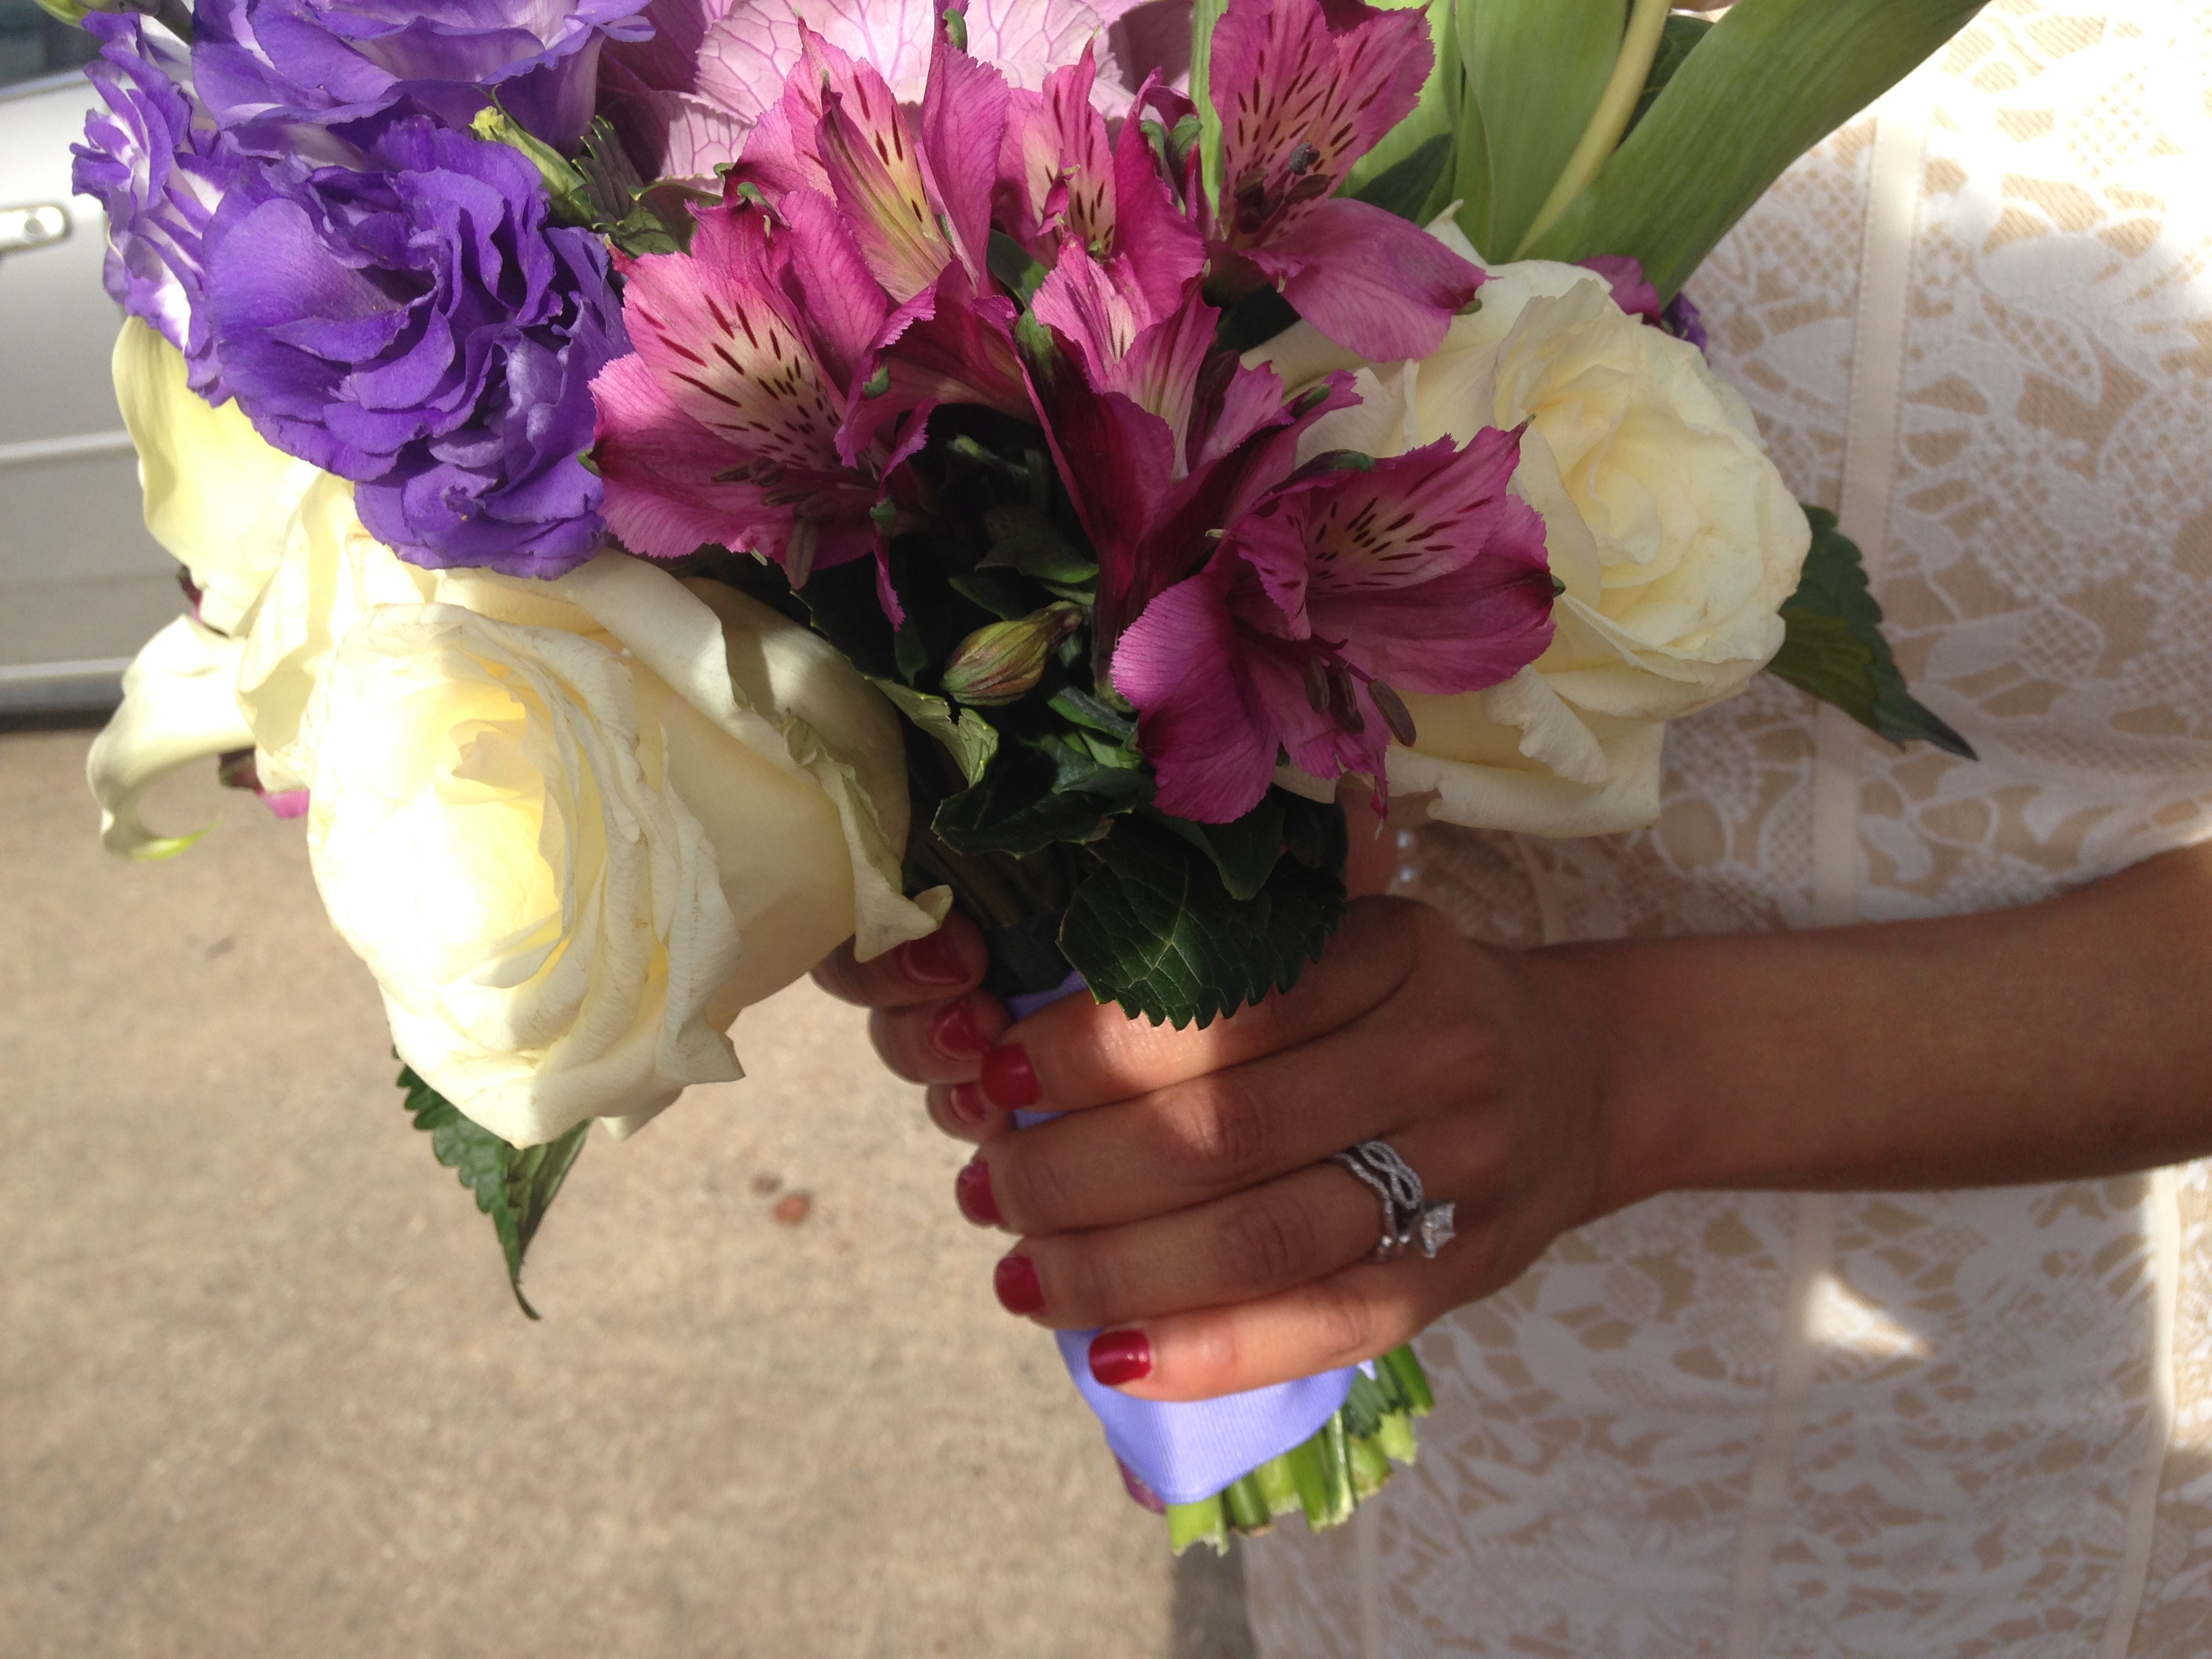 Tulips, Antique Pink + Green Hydrangeas, Cream Roses,  Lisianthus, &Ornamental Cabbage